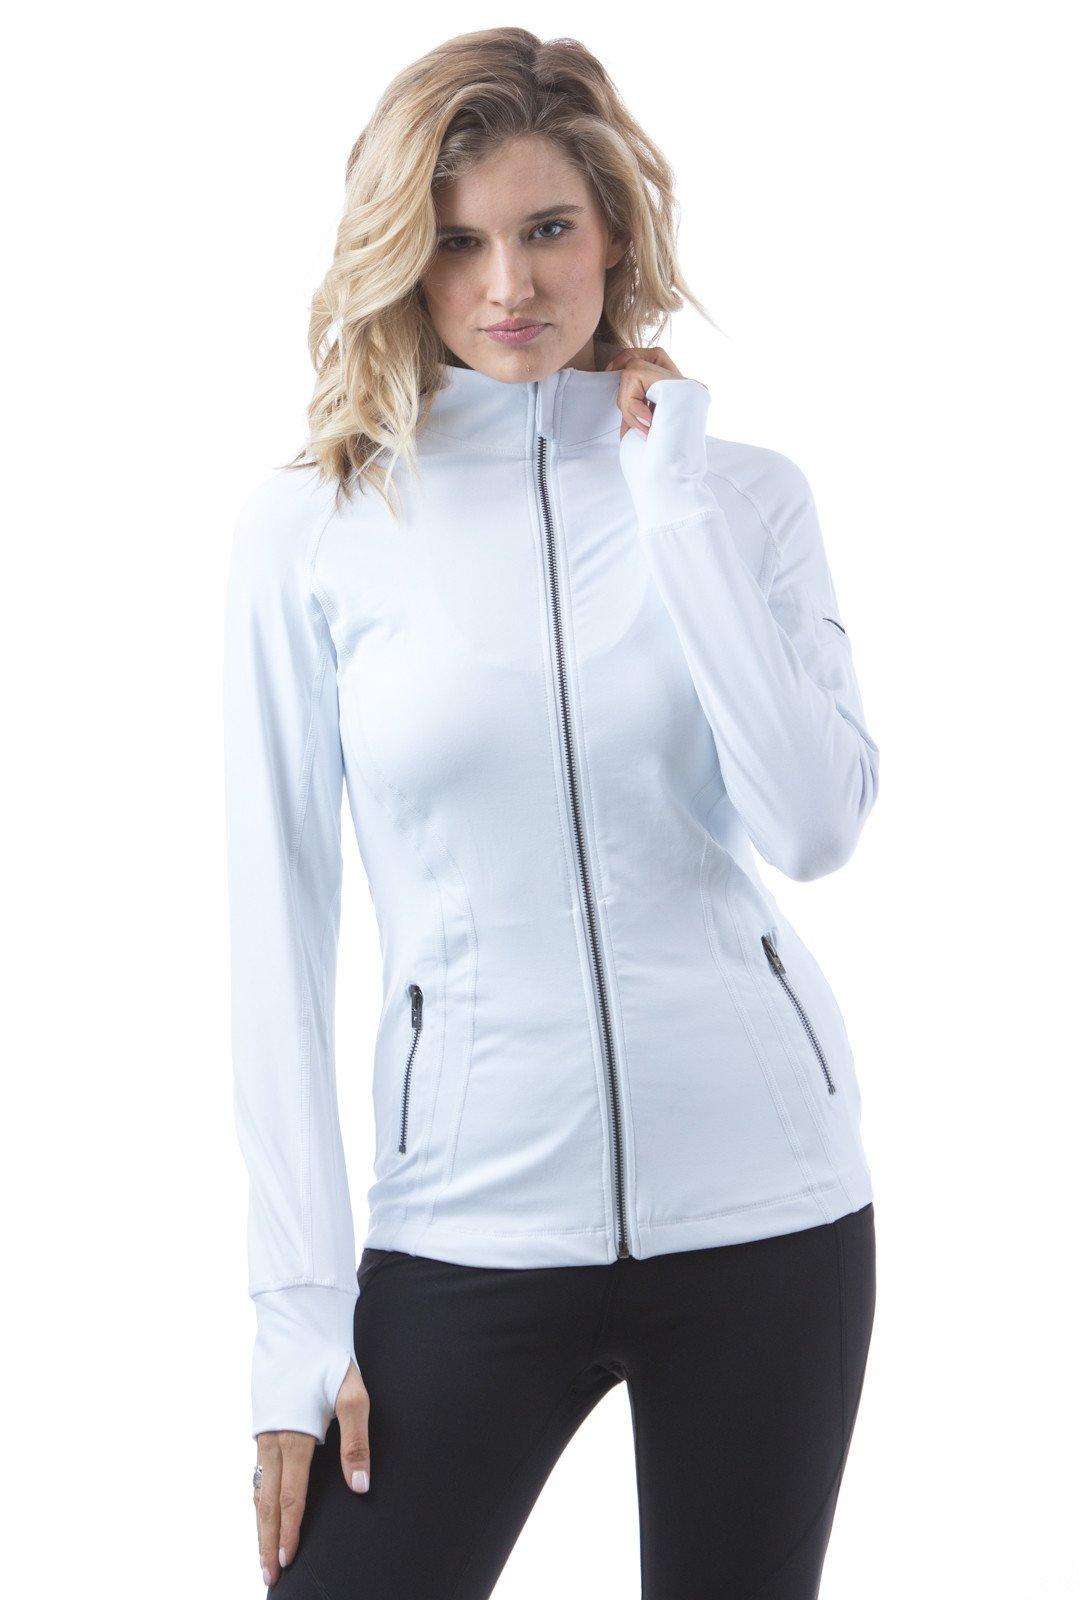 Figur Activ Women's Long Sleeve Beck High Performance Activ Zip-up Jacket